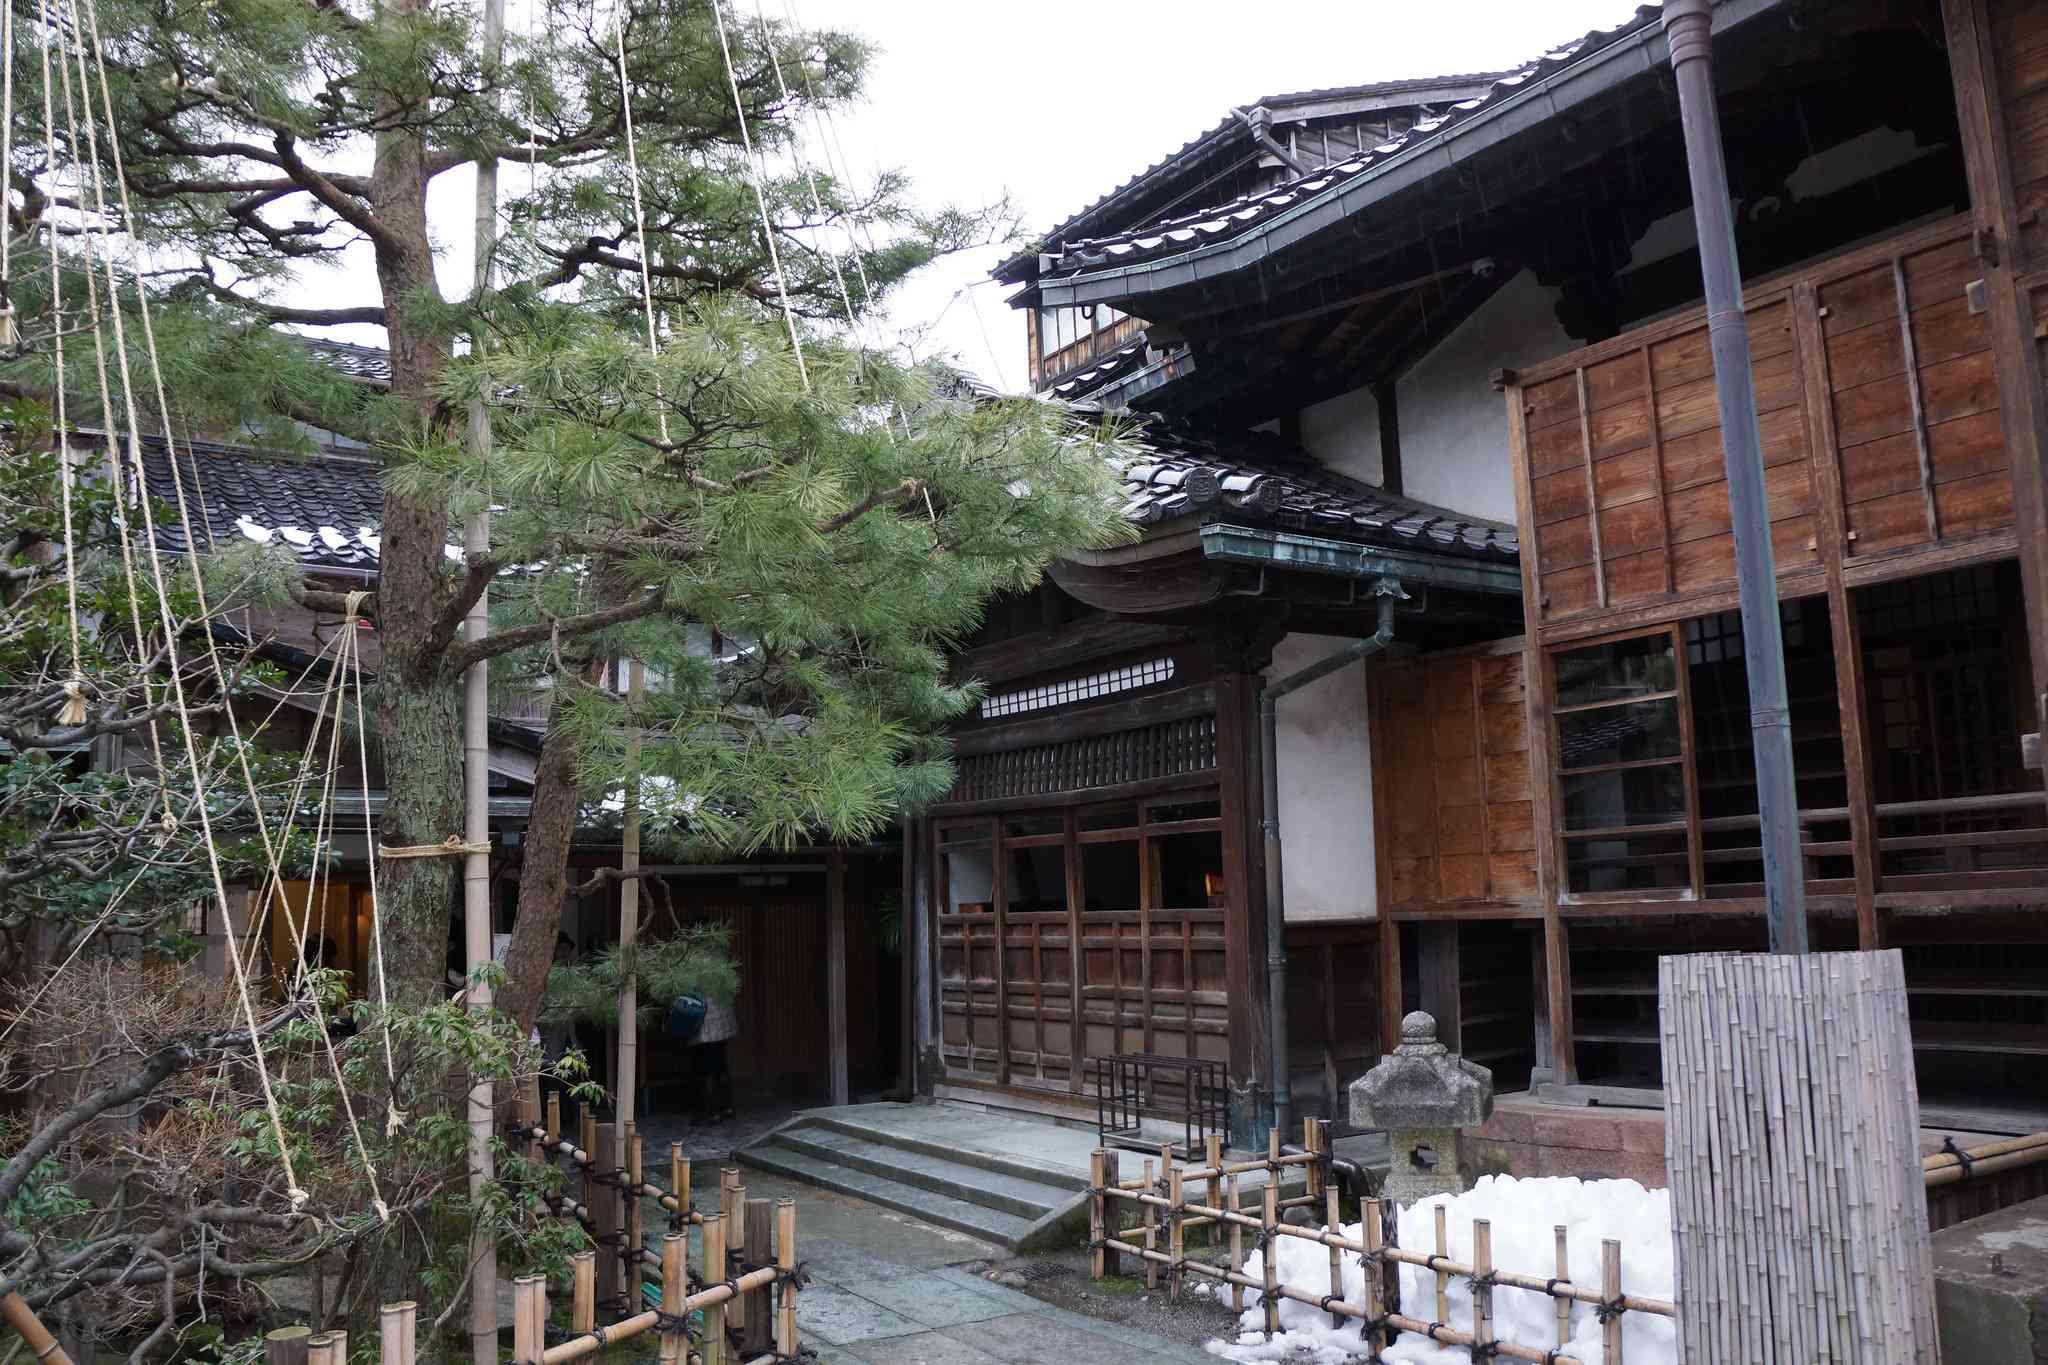 Outside of Myoryuji Temple during winter